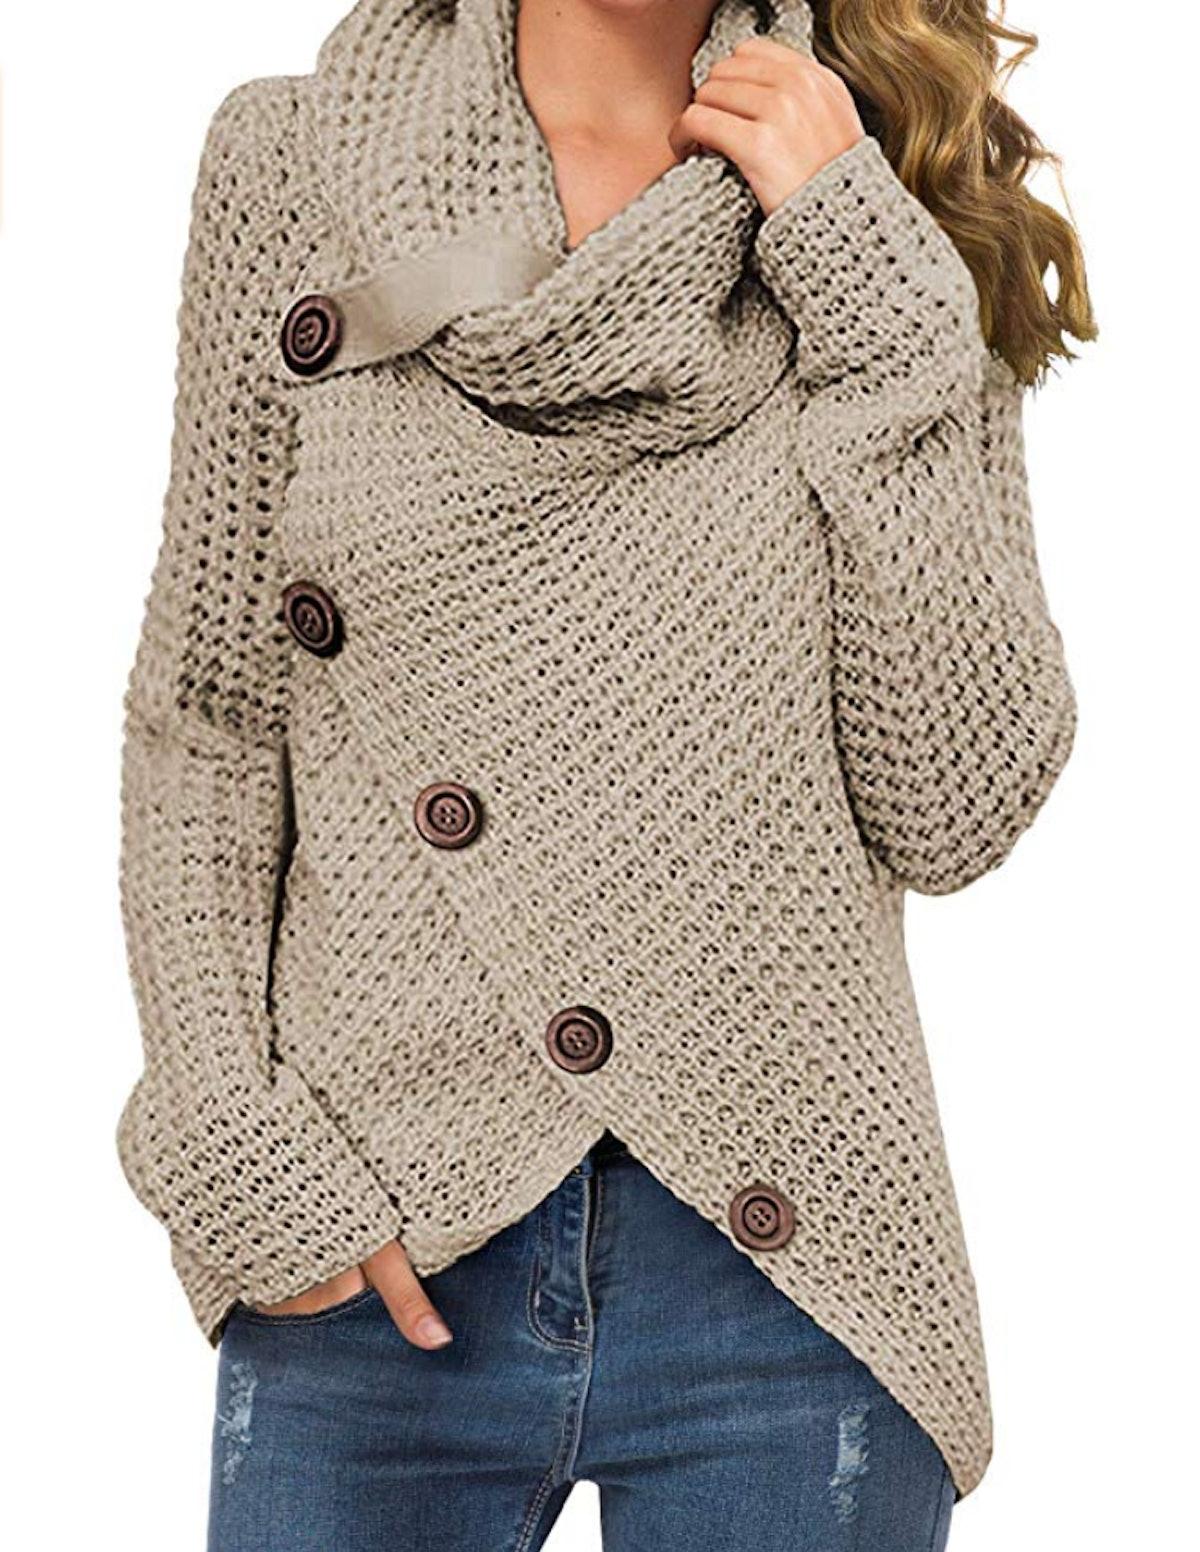 GRECERELLE Cowl Neck Wrap Sweater